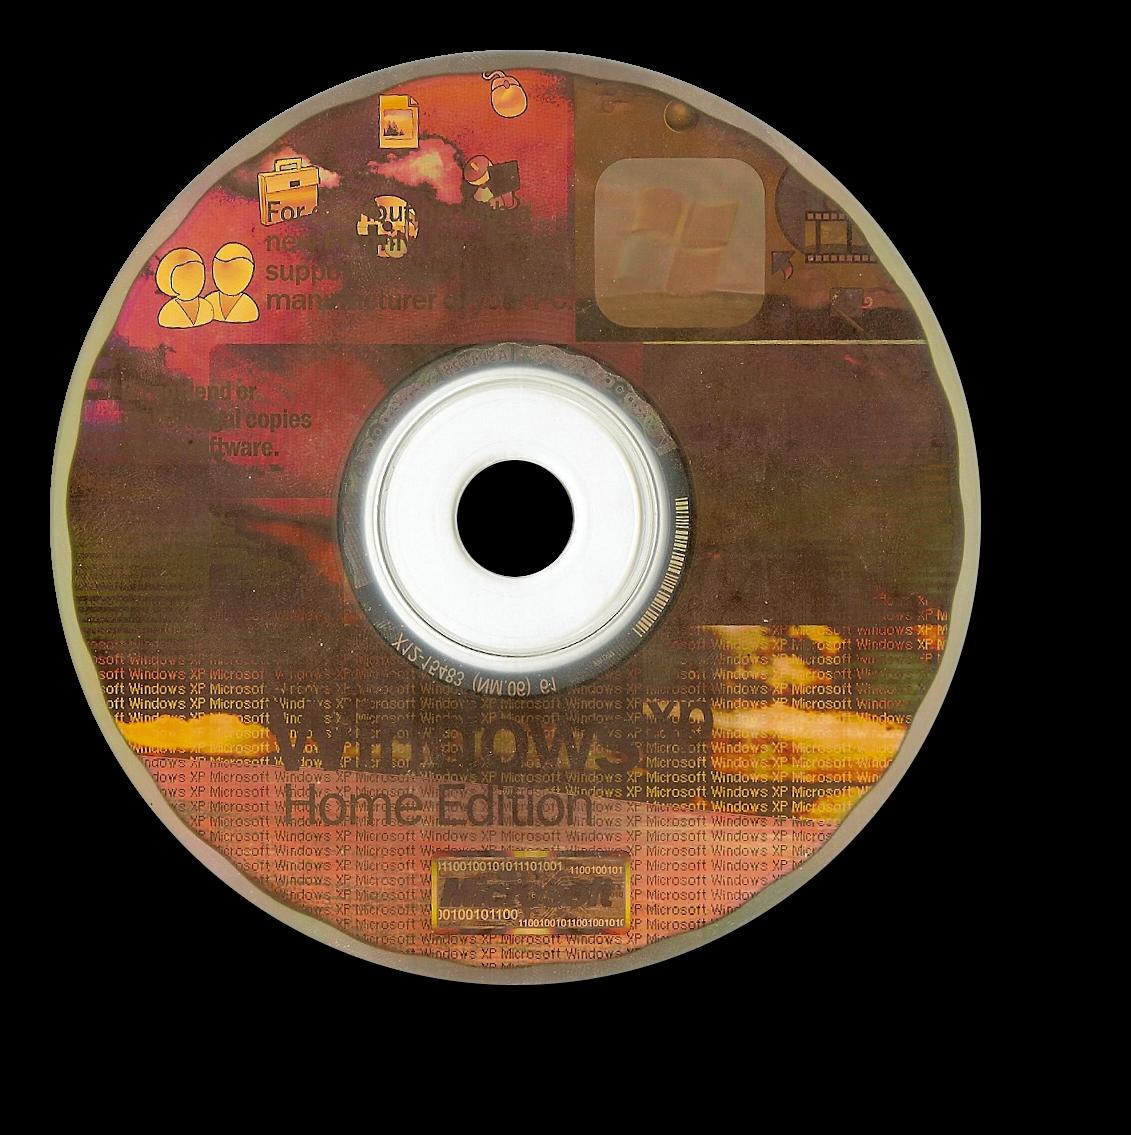 Download windows xp service pack 2 sp2.